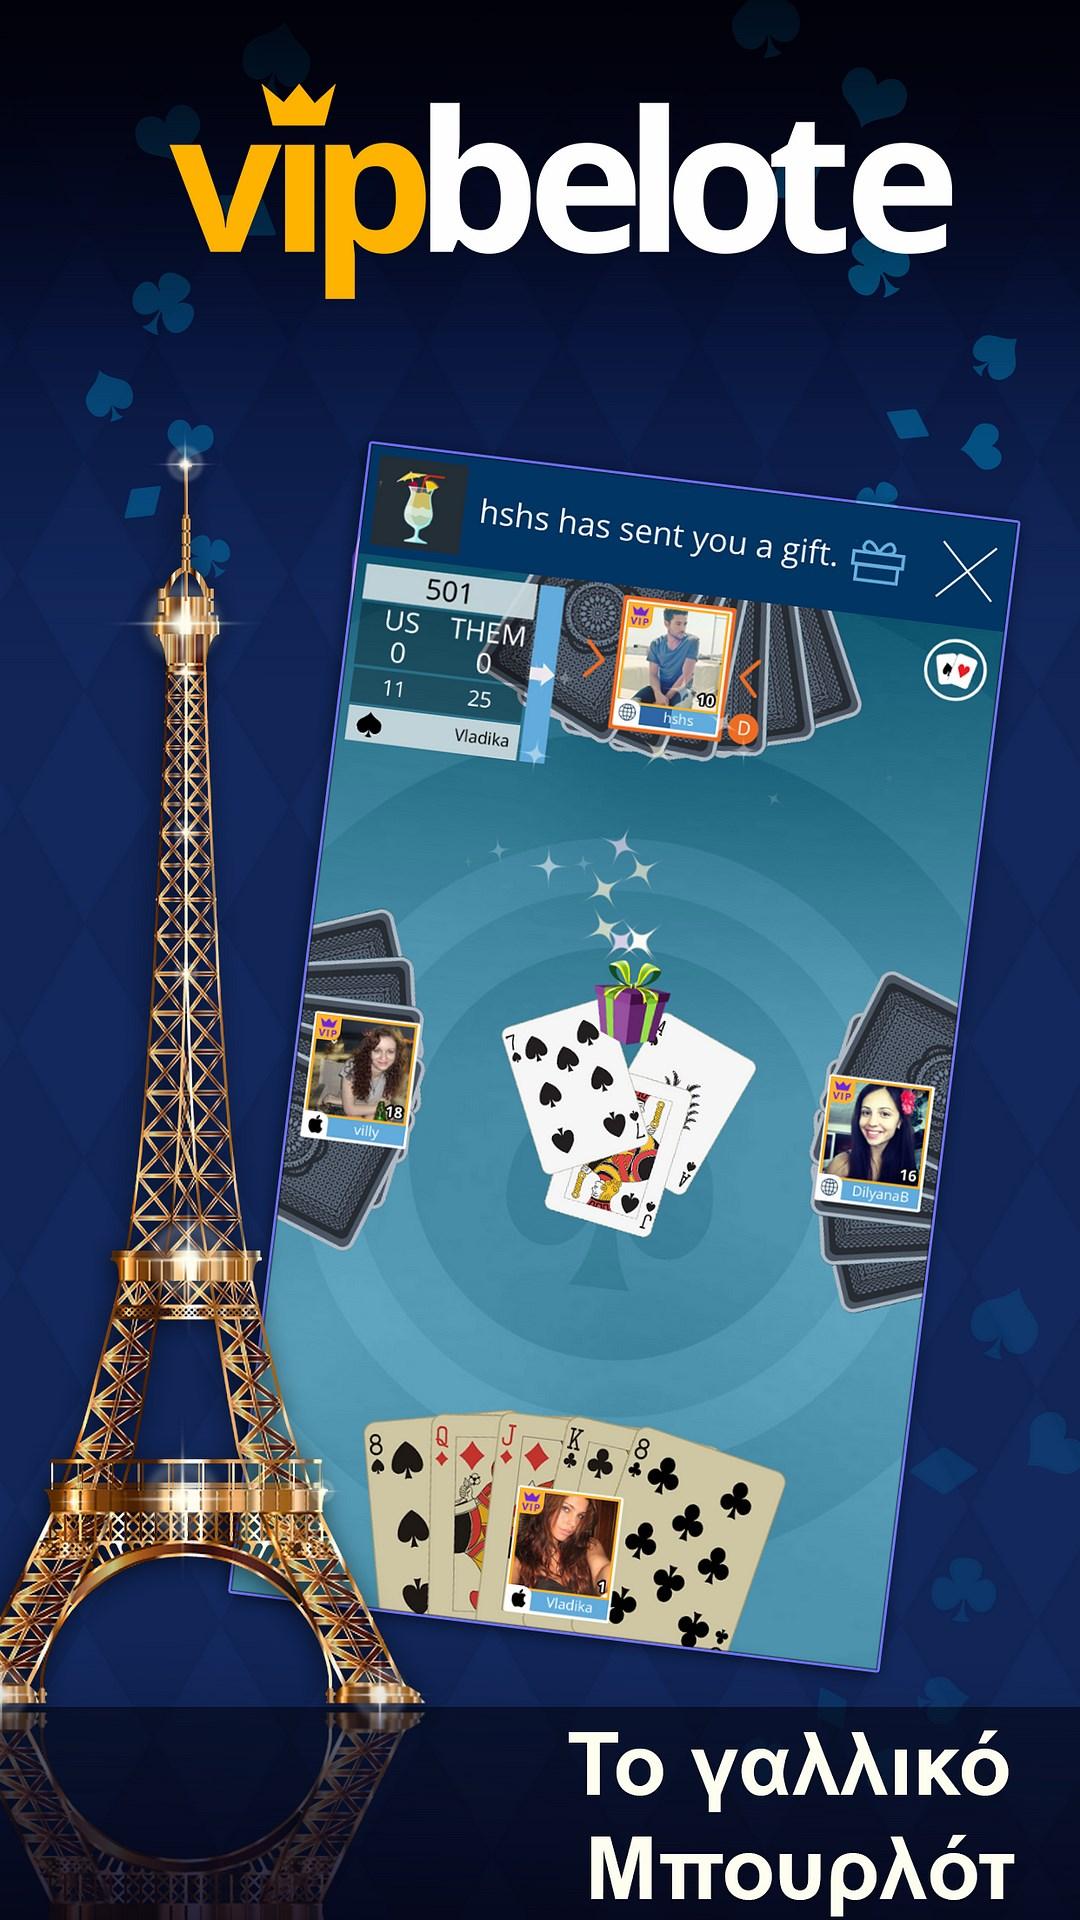 online παιχνίδια γνωριμιών για πολλούς παίκτεςonline dating στην πραγματική ζωή